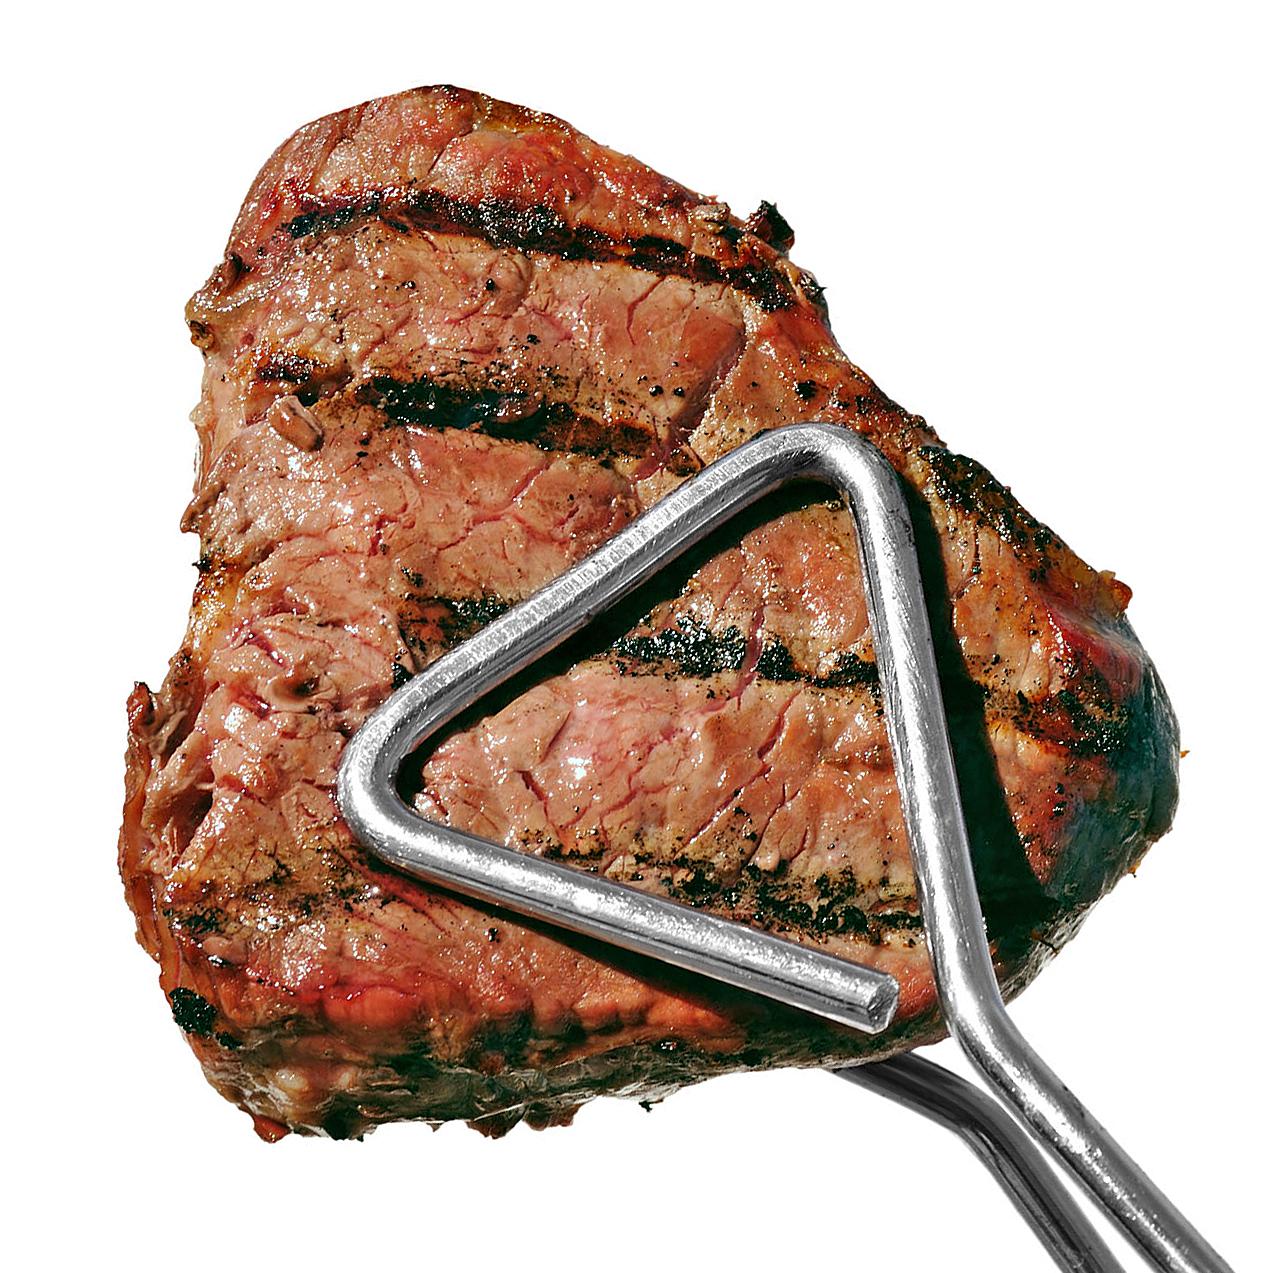 grilled steak tongs